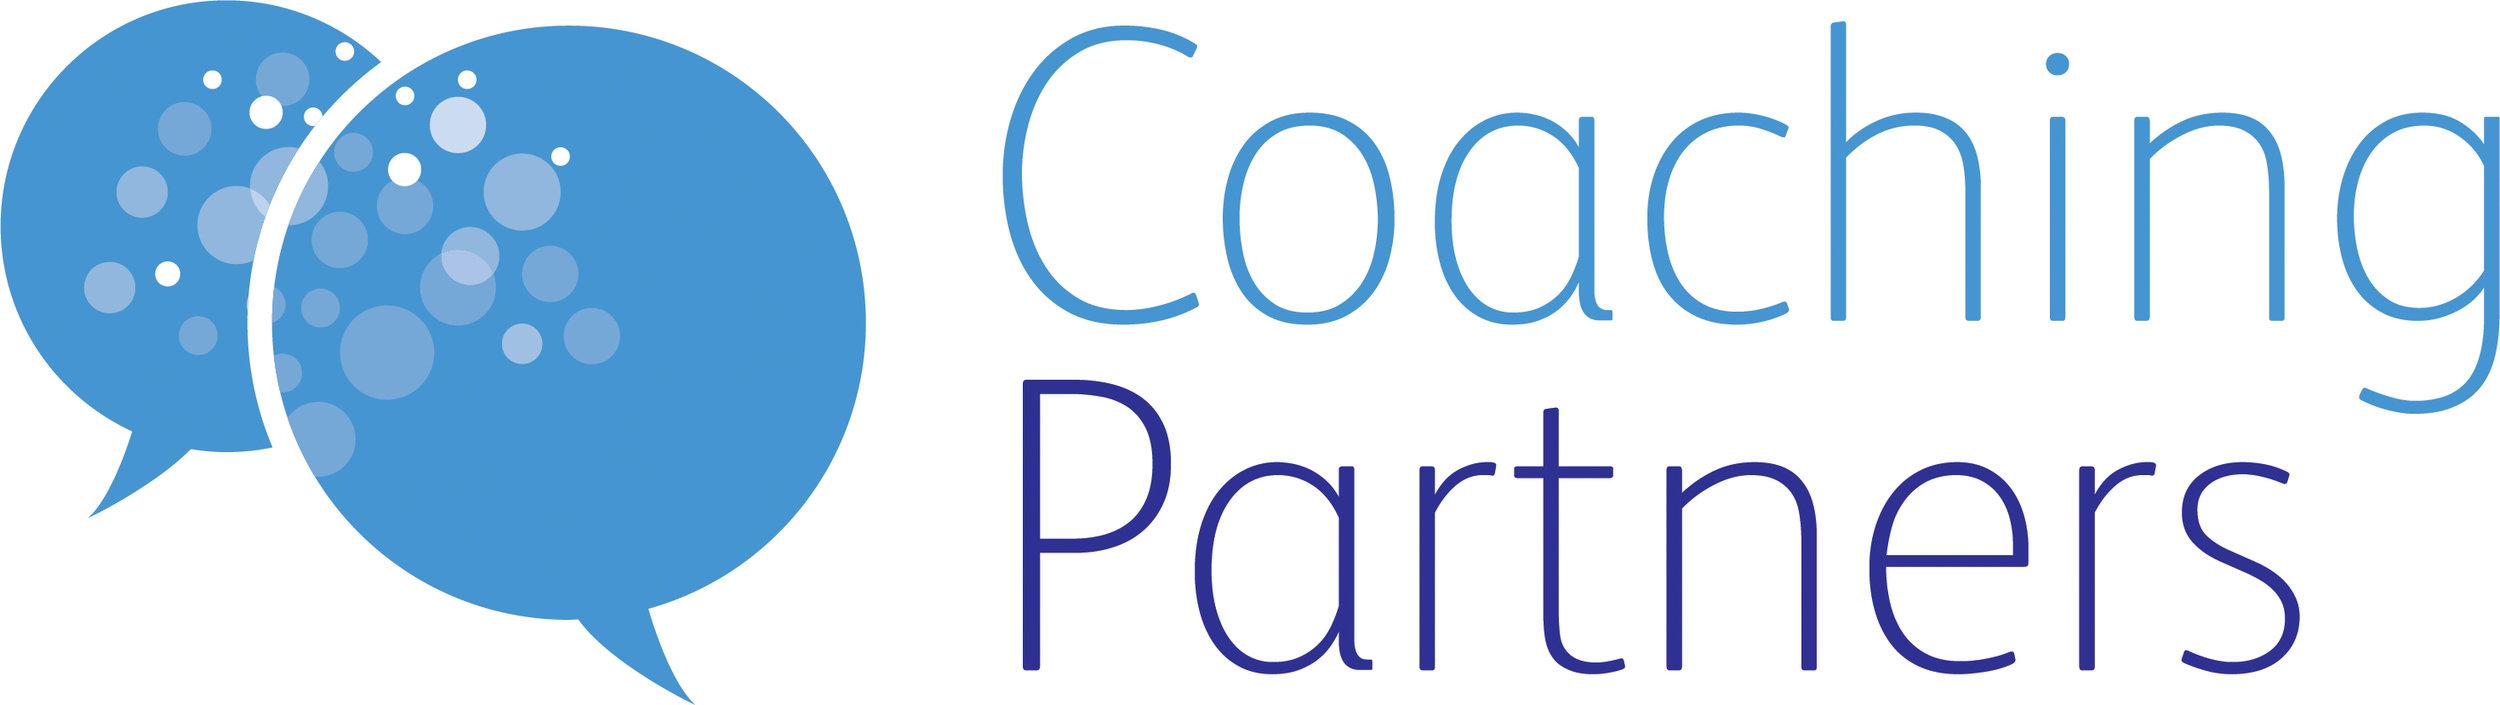 Coaching Partnersrgb.jpg